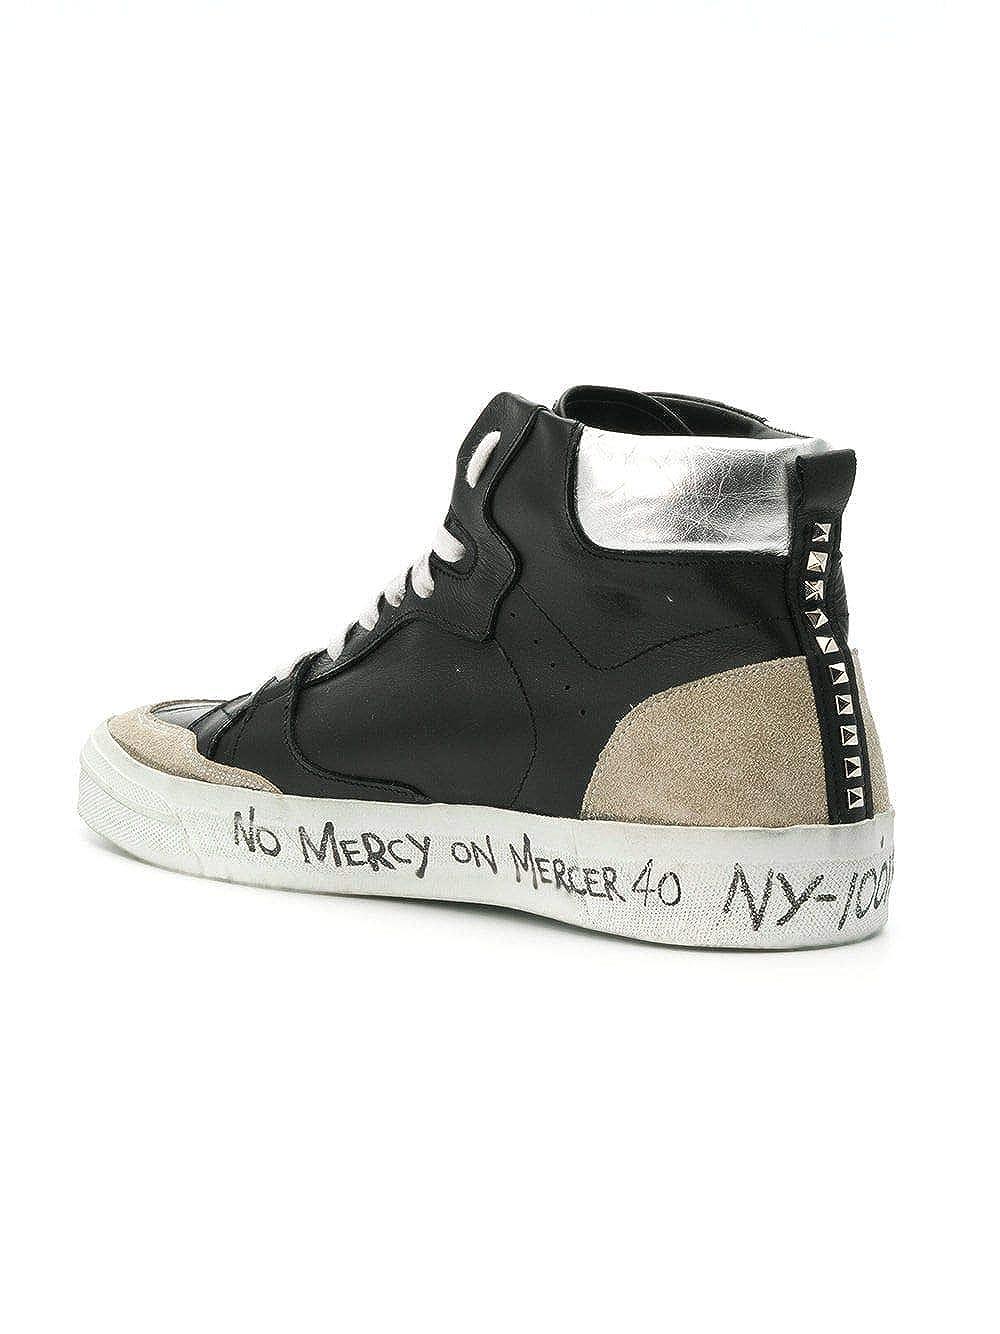 PHILIPP PLEIN, Sneaker Uomo Nero Nero IT Marke Größe, Nero